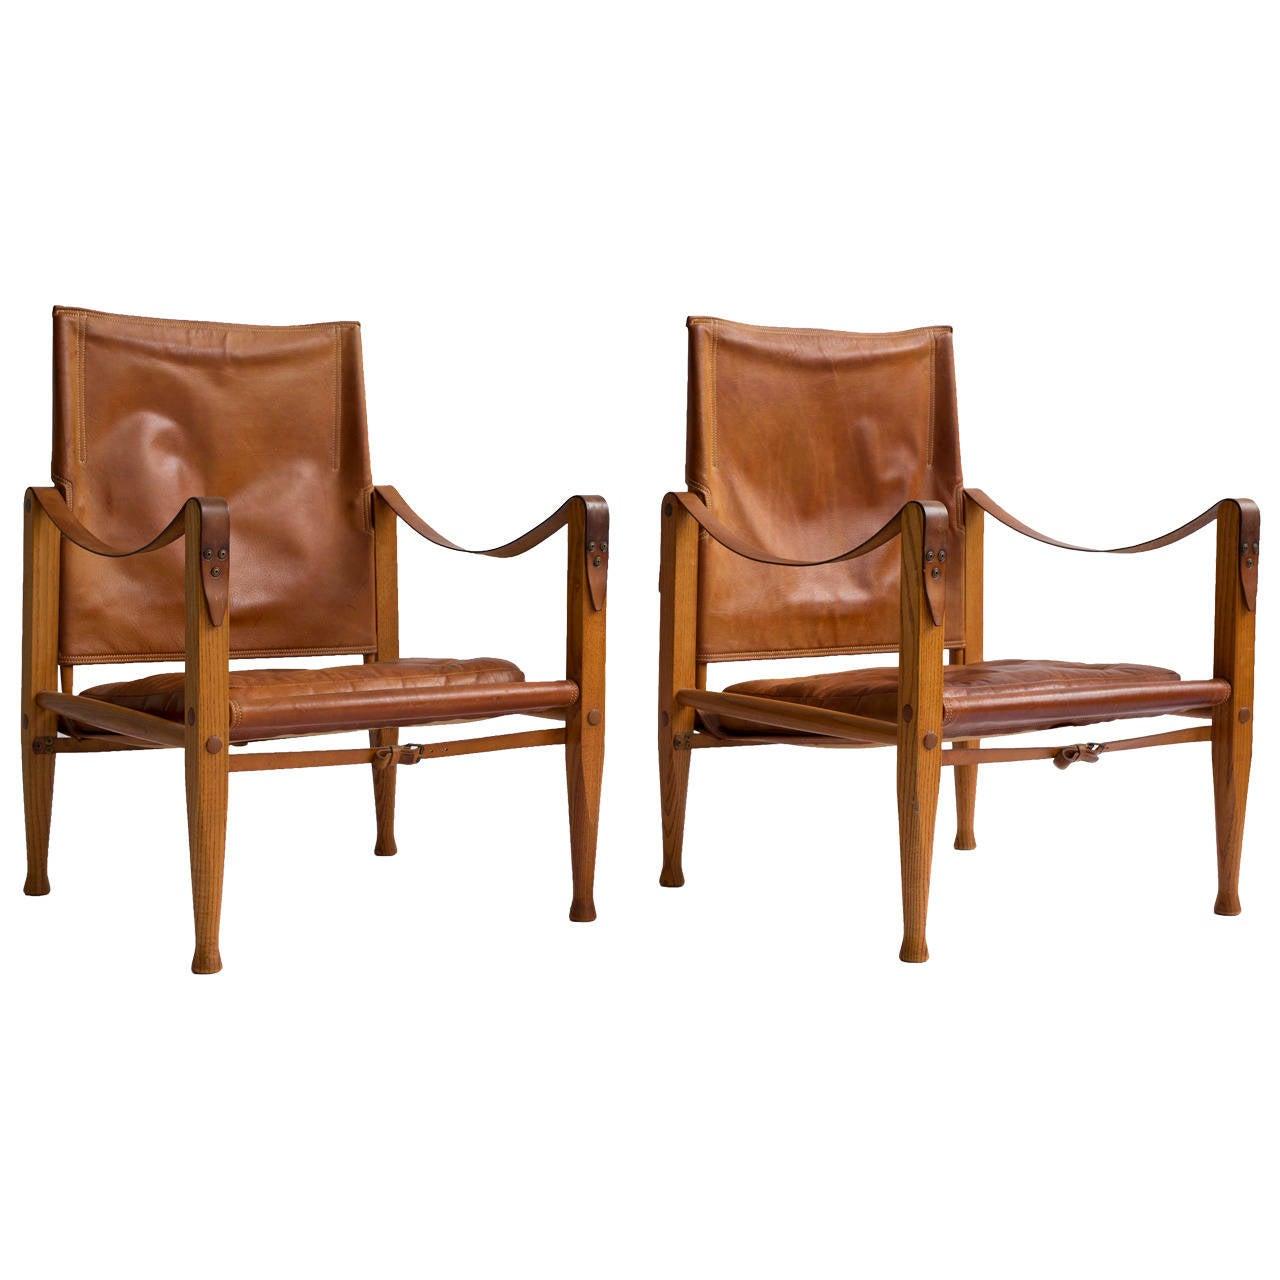 Pair of Kaare Klint Safari chairs for Rud Rasmussen, 1933